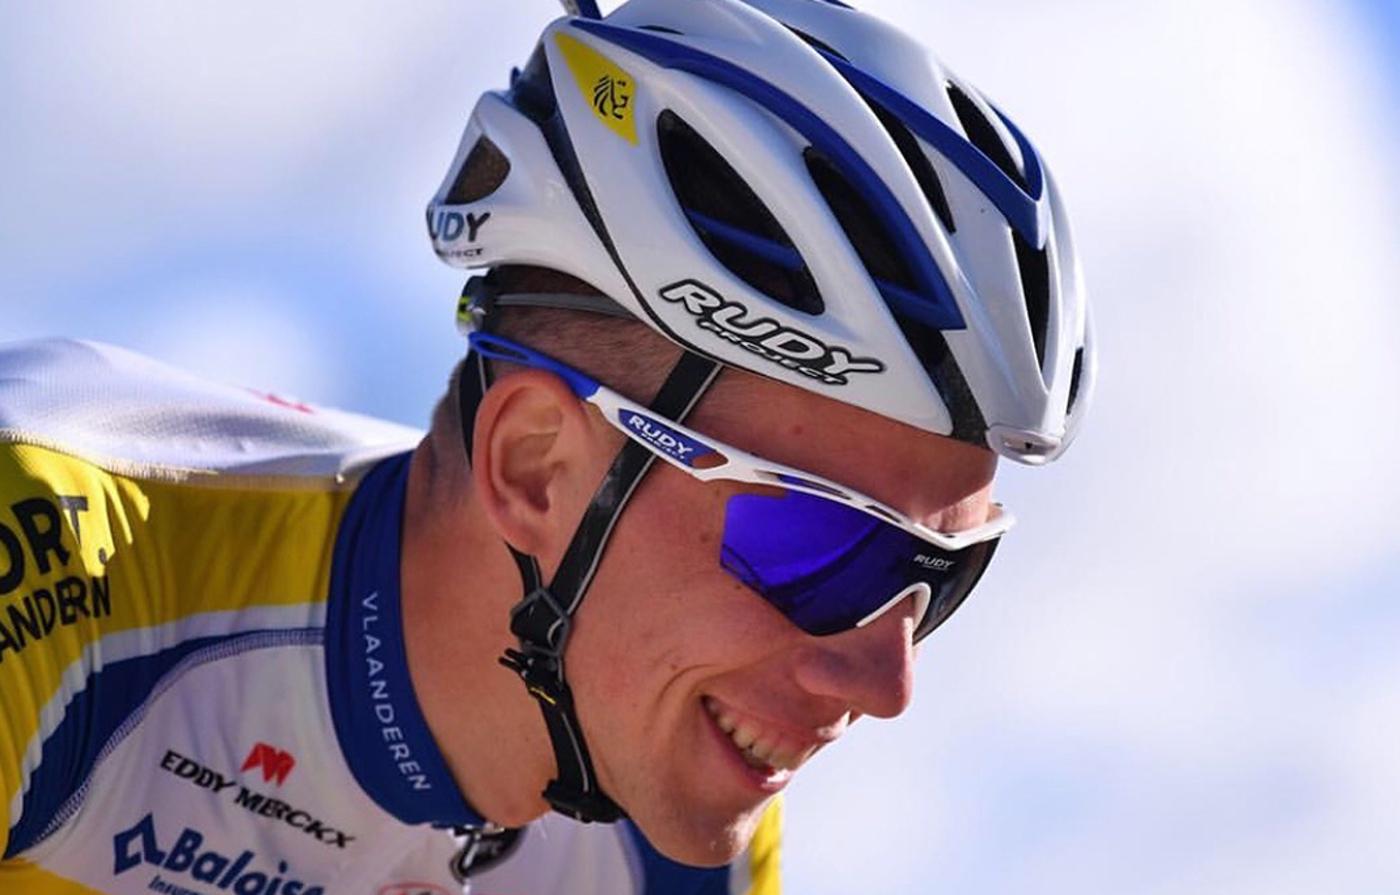 Gafas Rudy Project Tralyx y casco Race Master